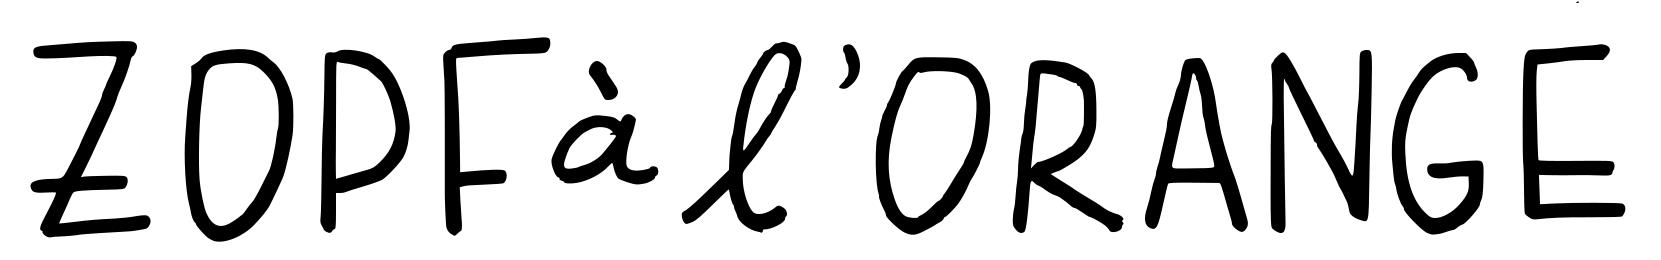 zopf a lorange